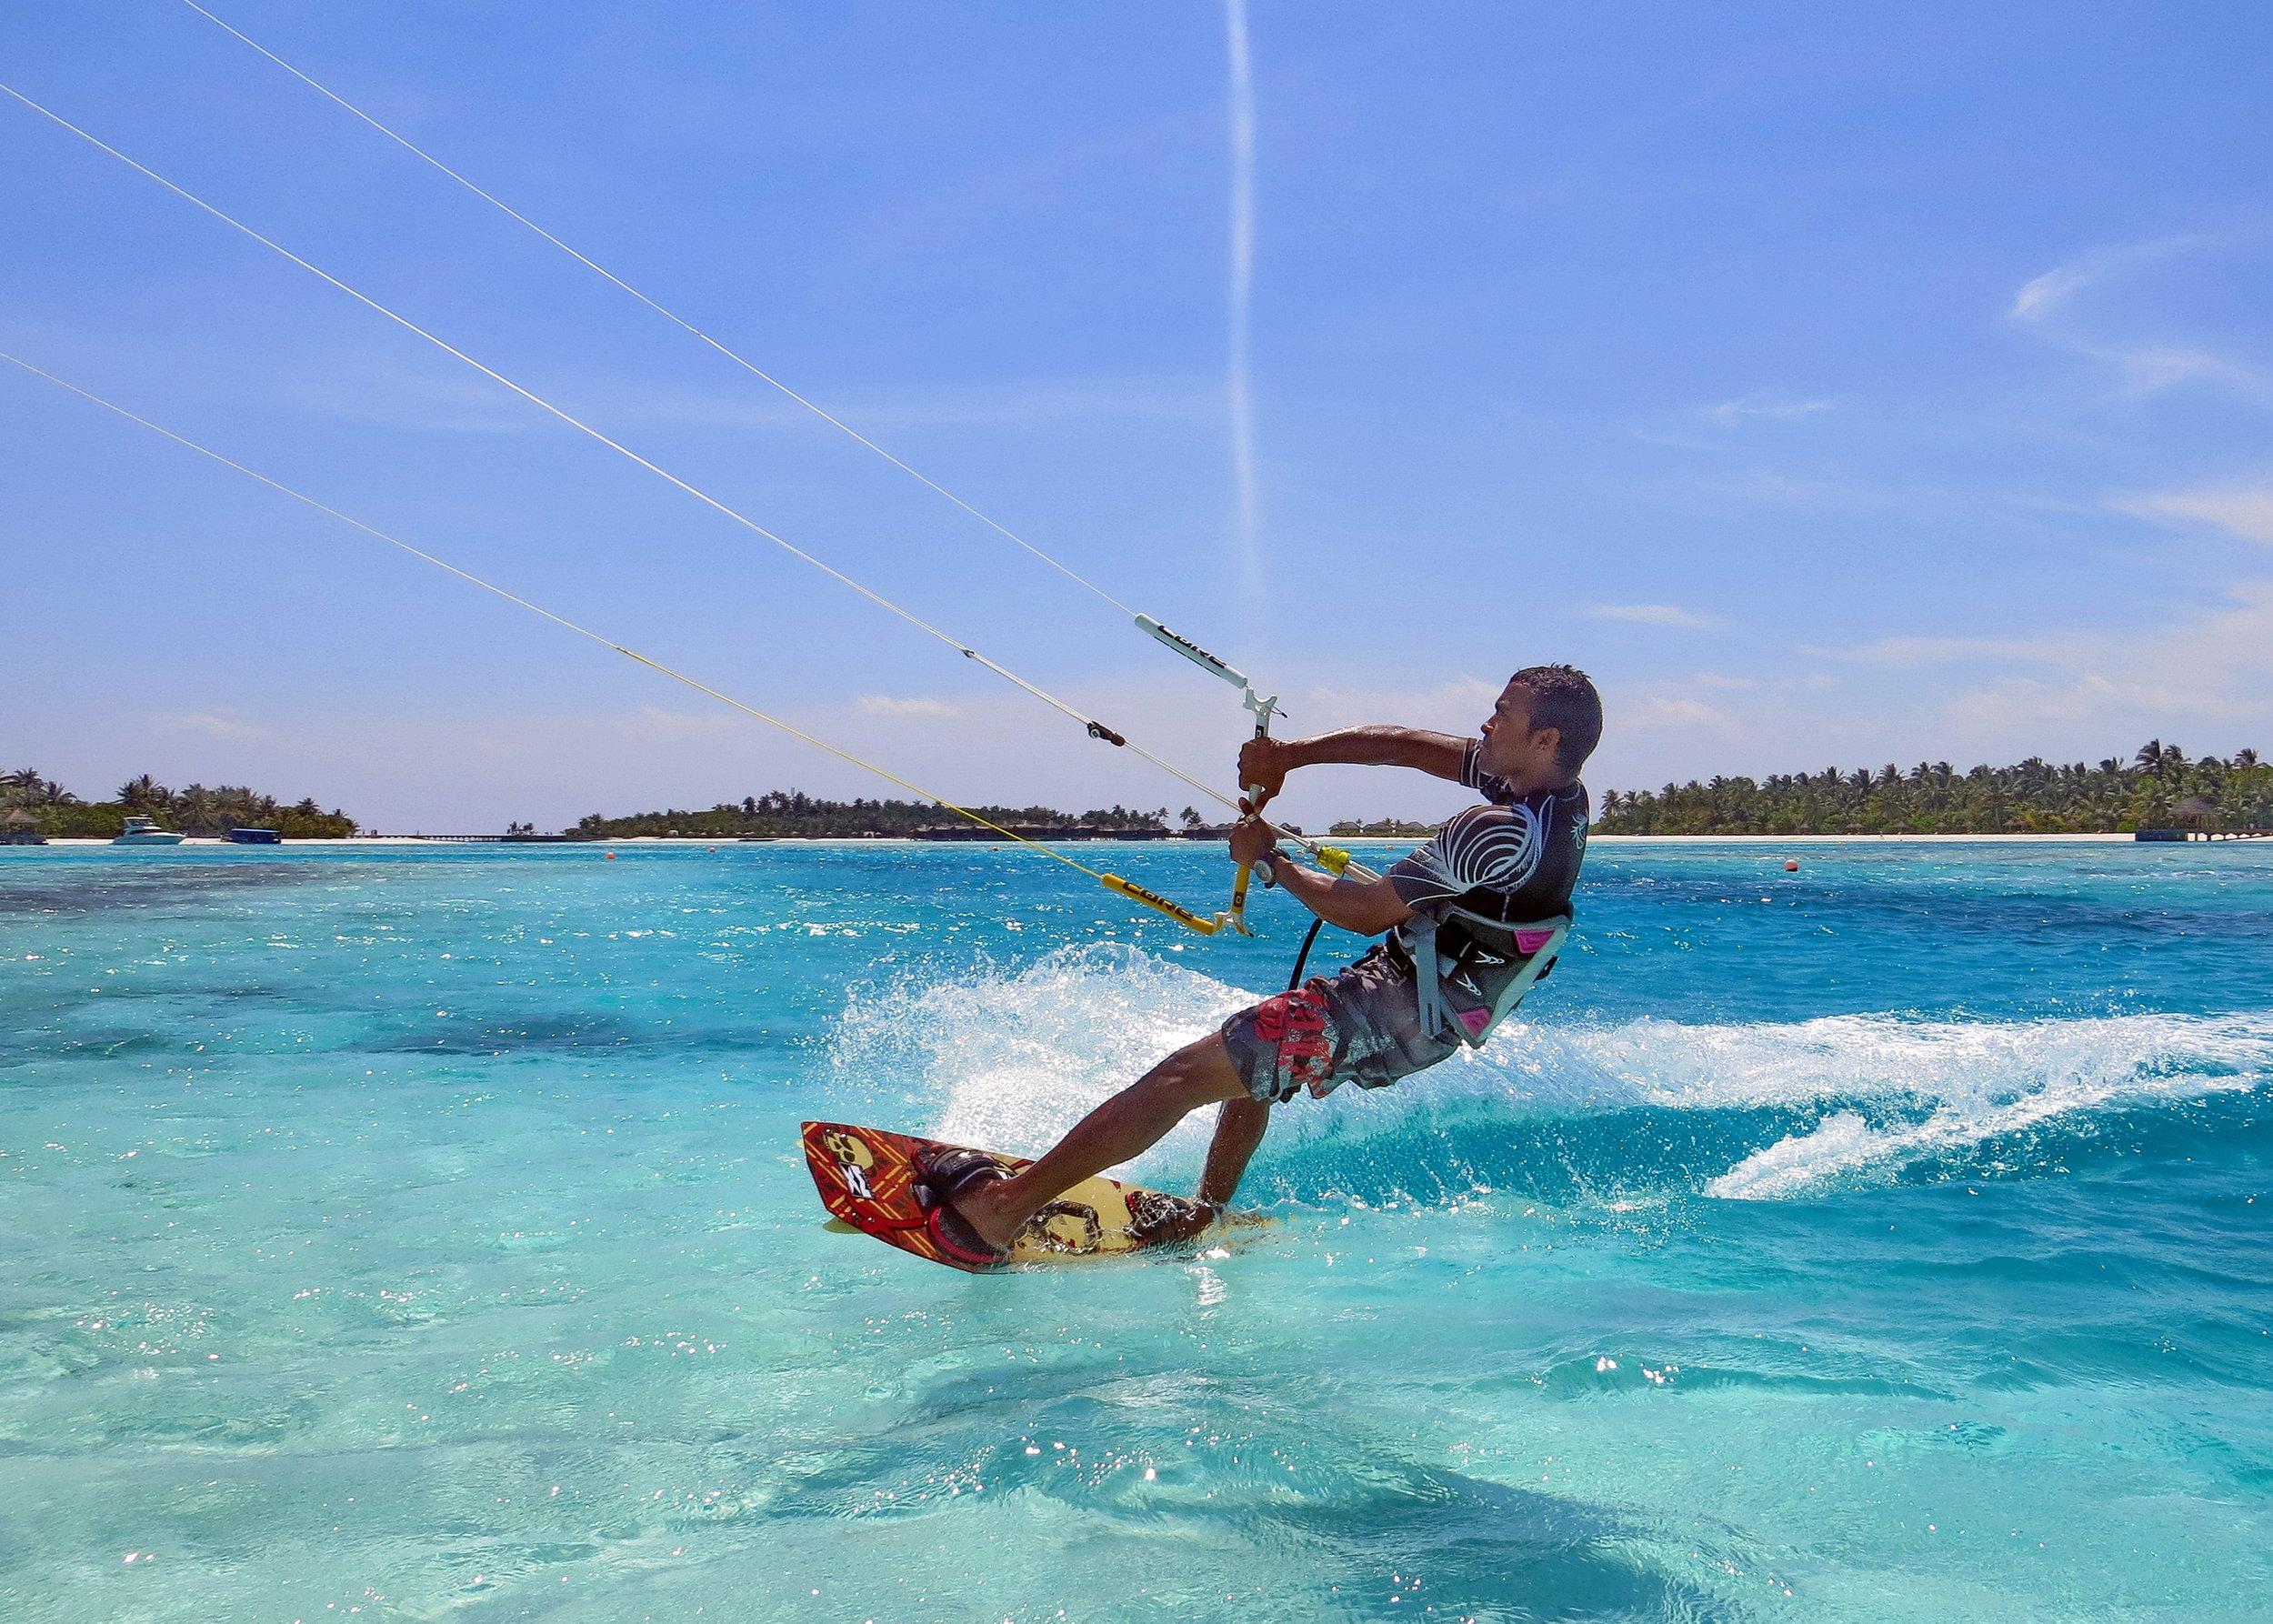 Anantara_Veli_Kite_Surfing.JPG